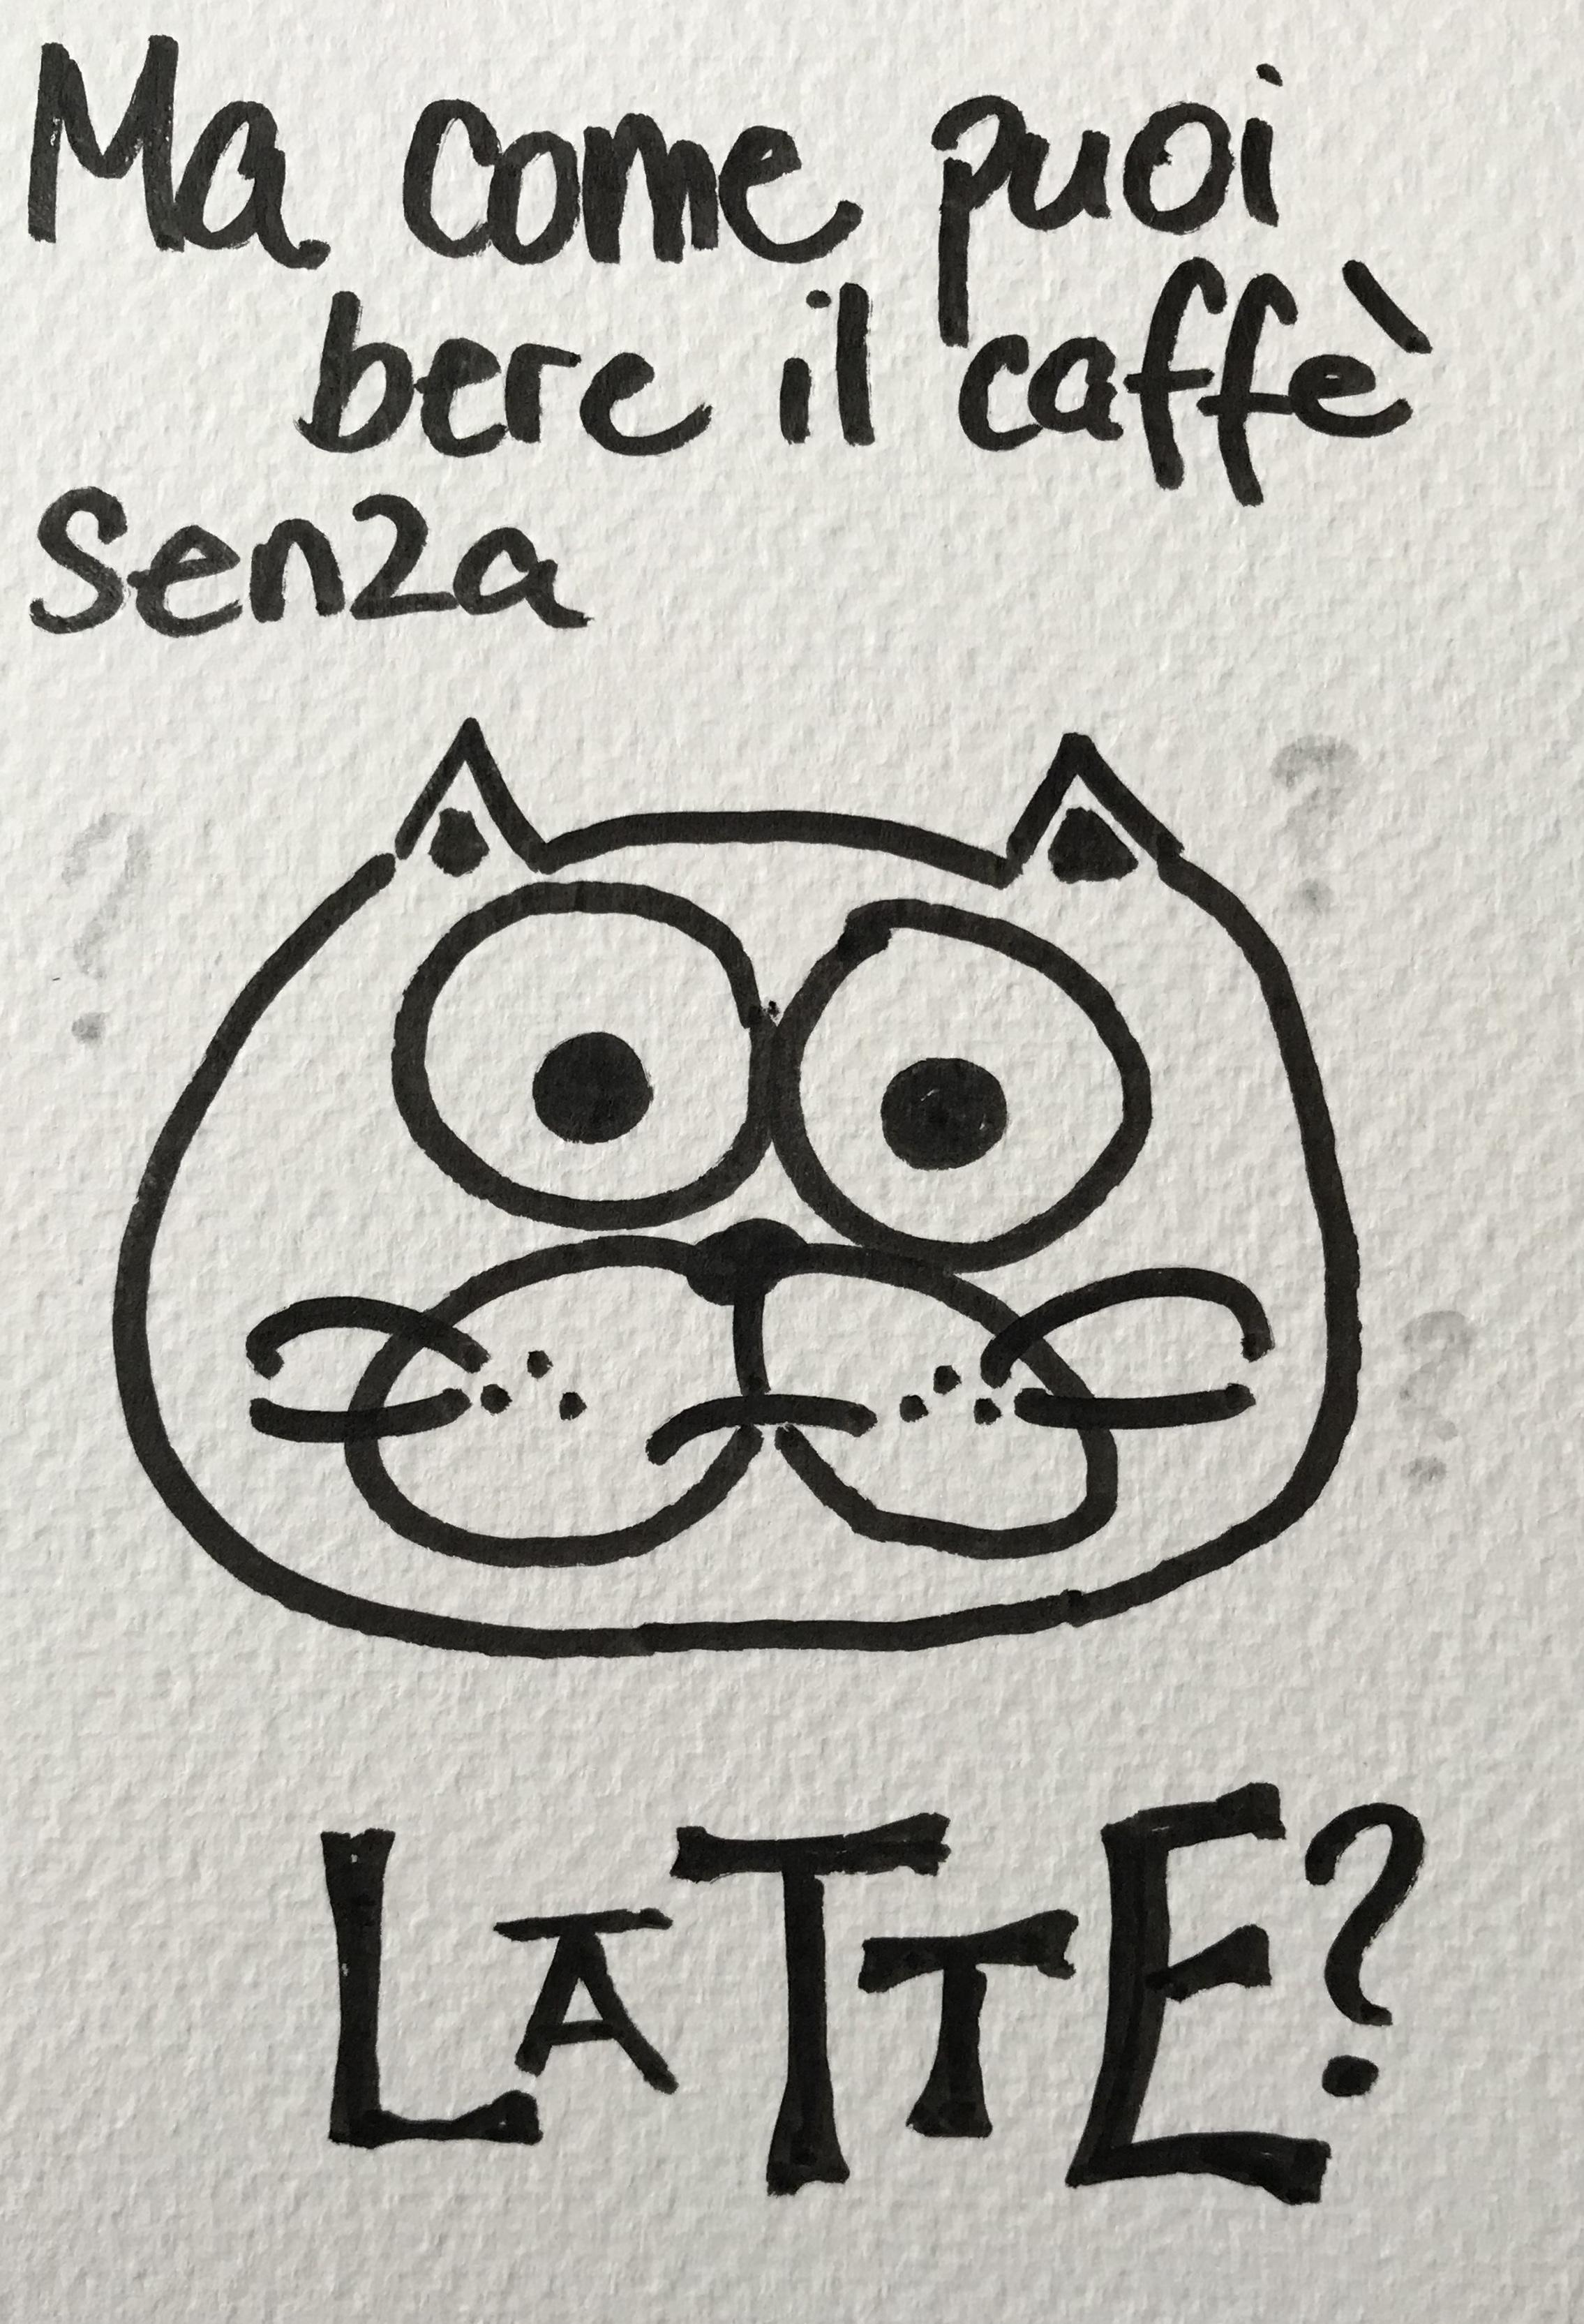 Ma come puoi bere il caffè senza LATTE miylk kitten art postcard marker calligraphy typography kawai